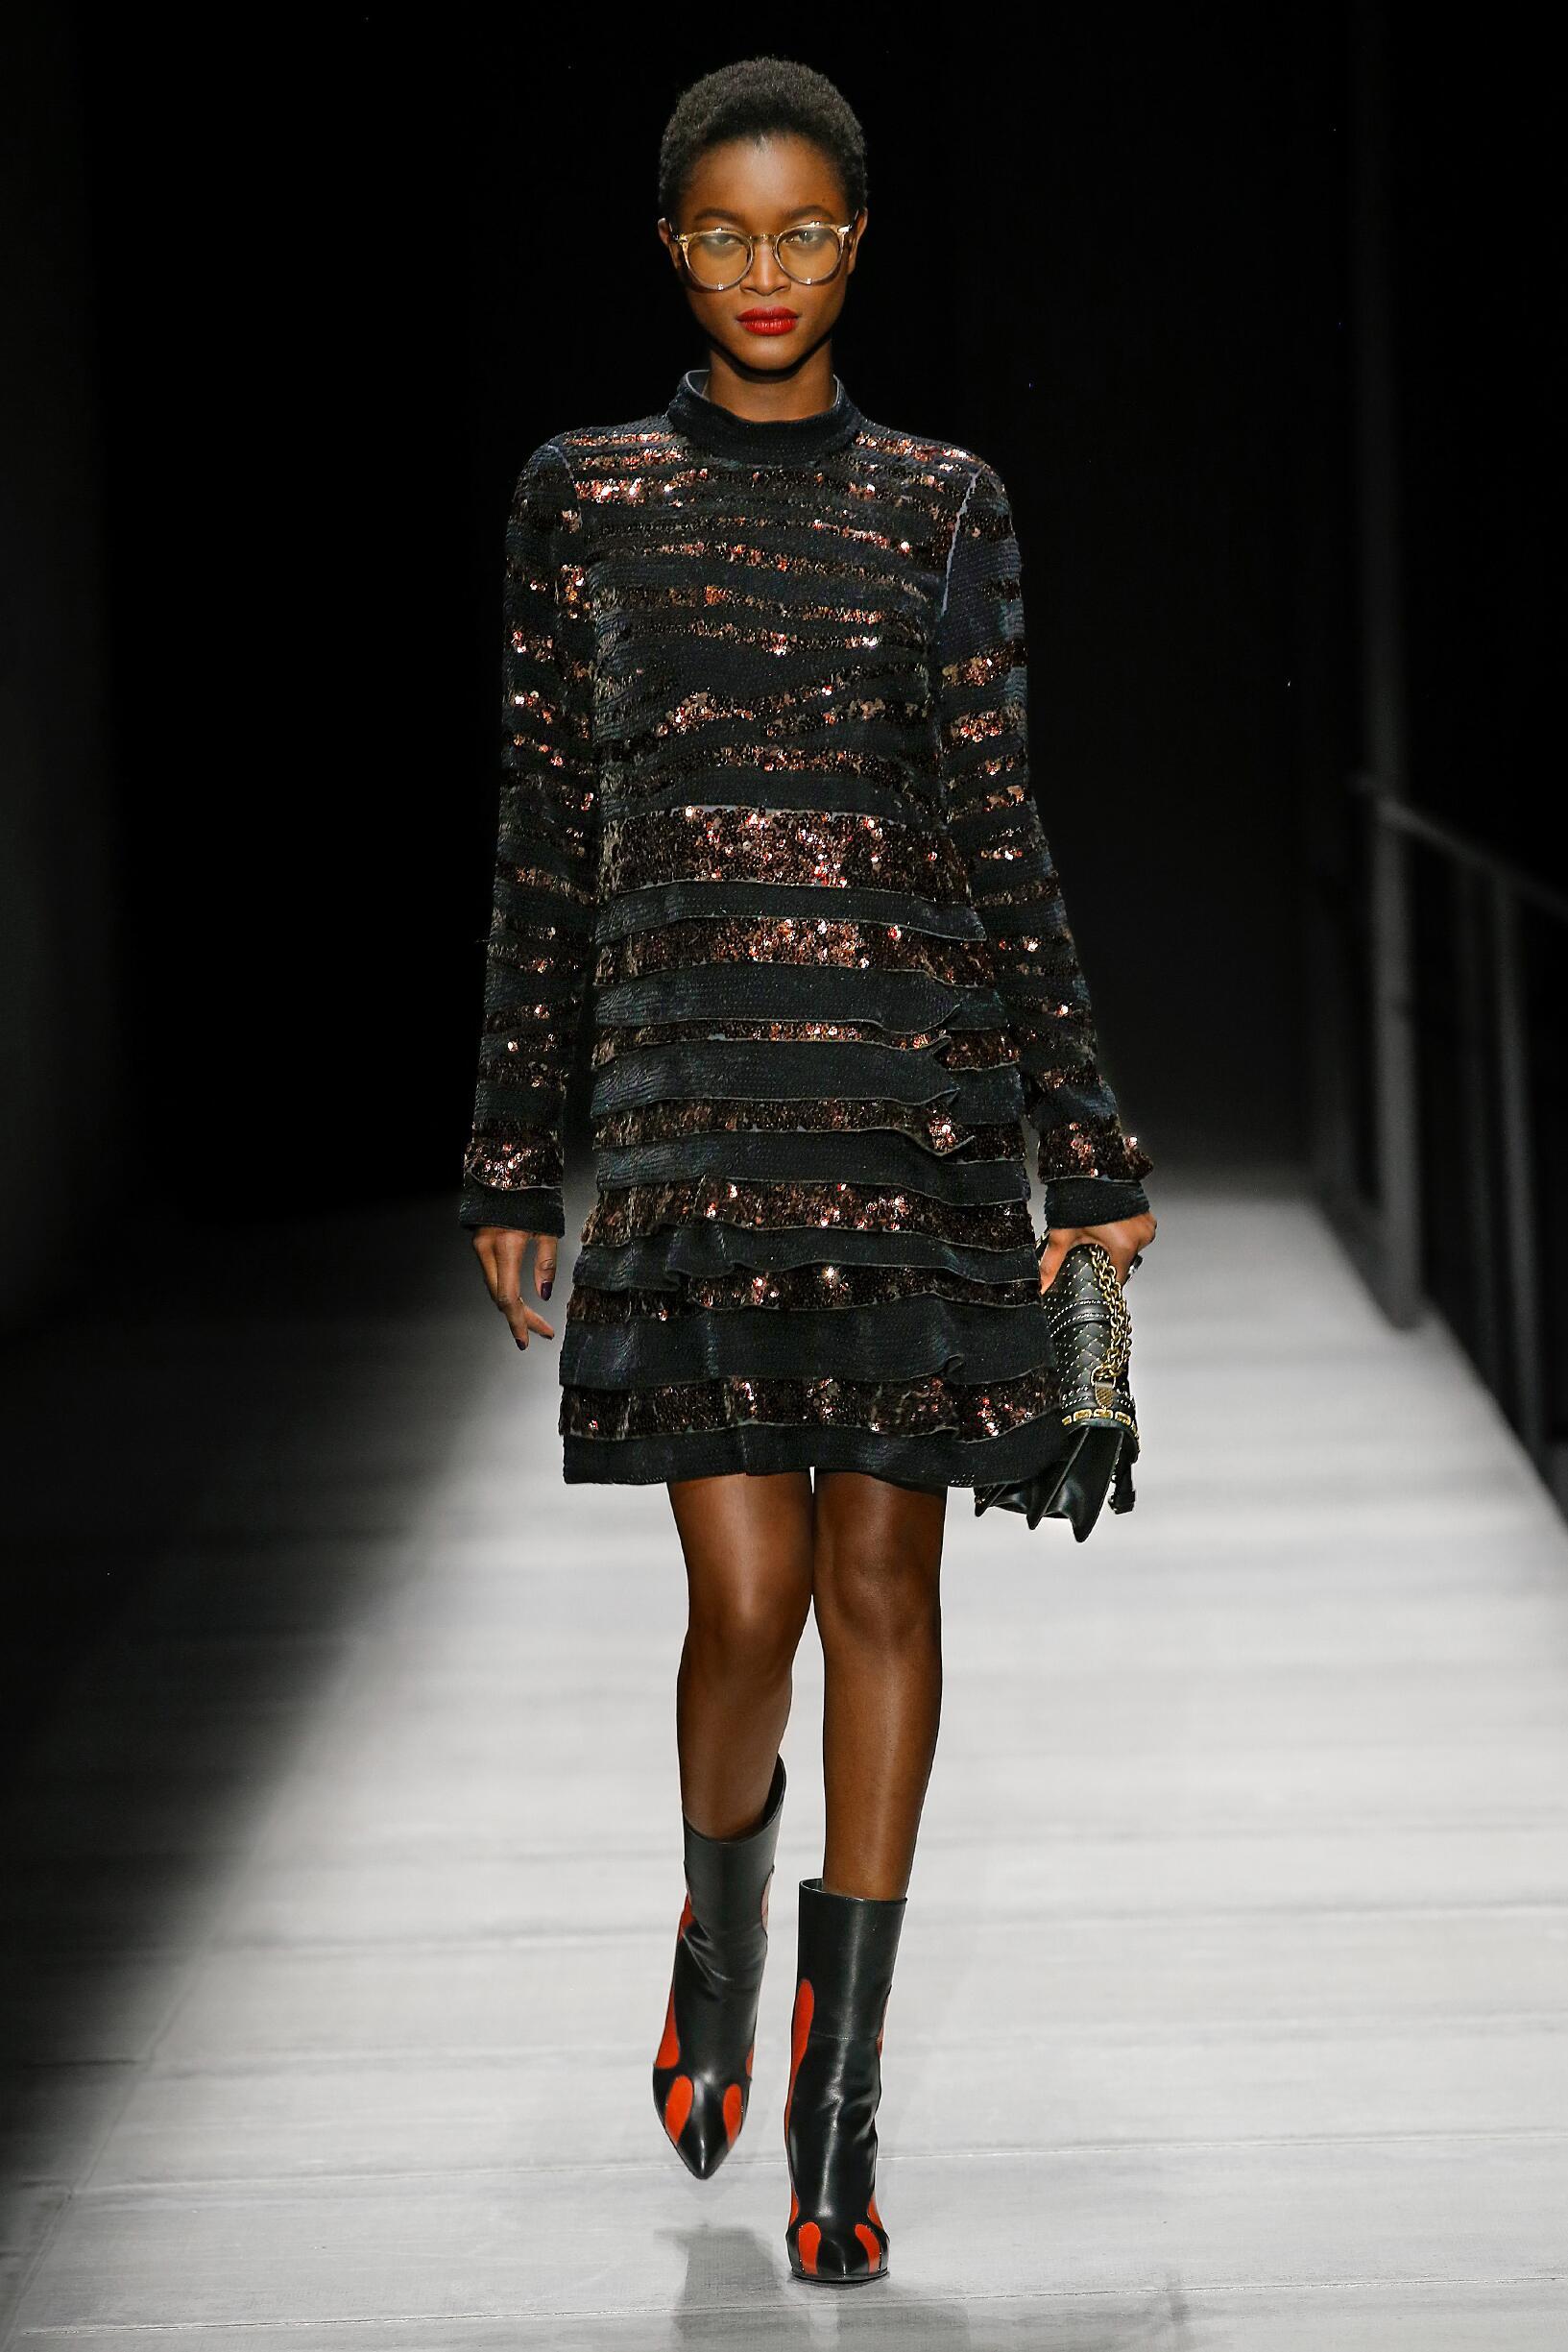 2018 Catwalk Bottega Veneta Woman Fashion Show Winter